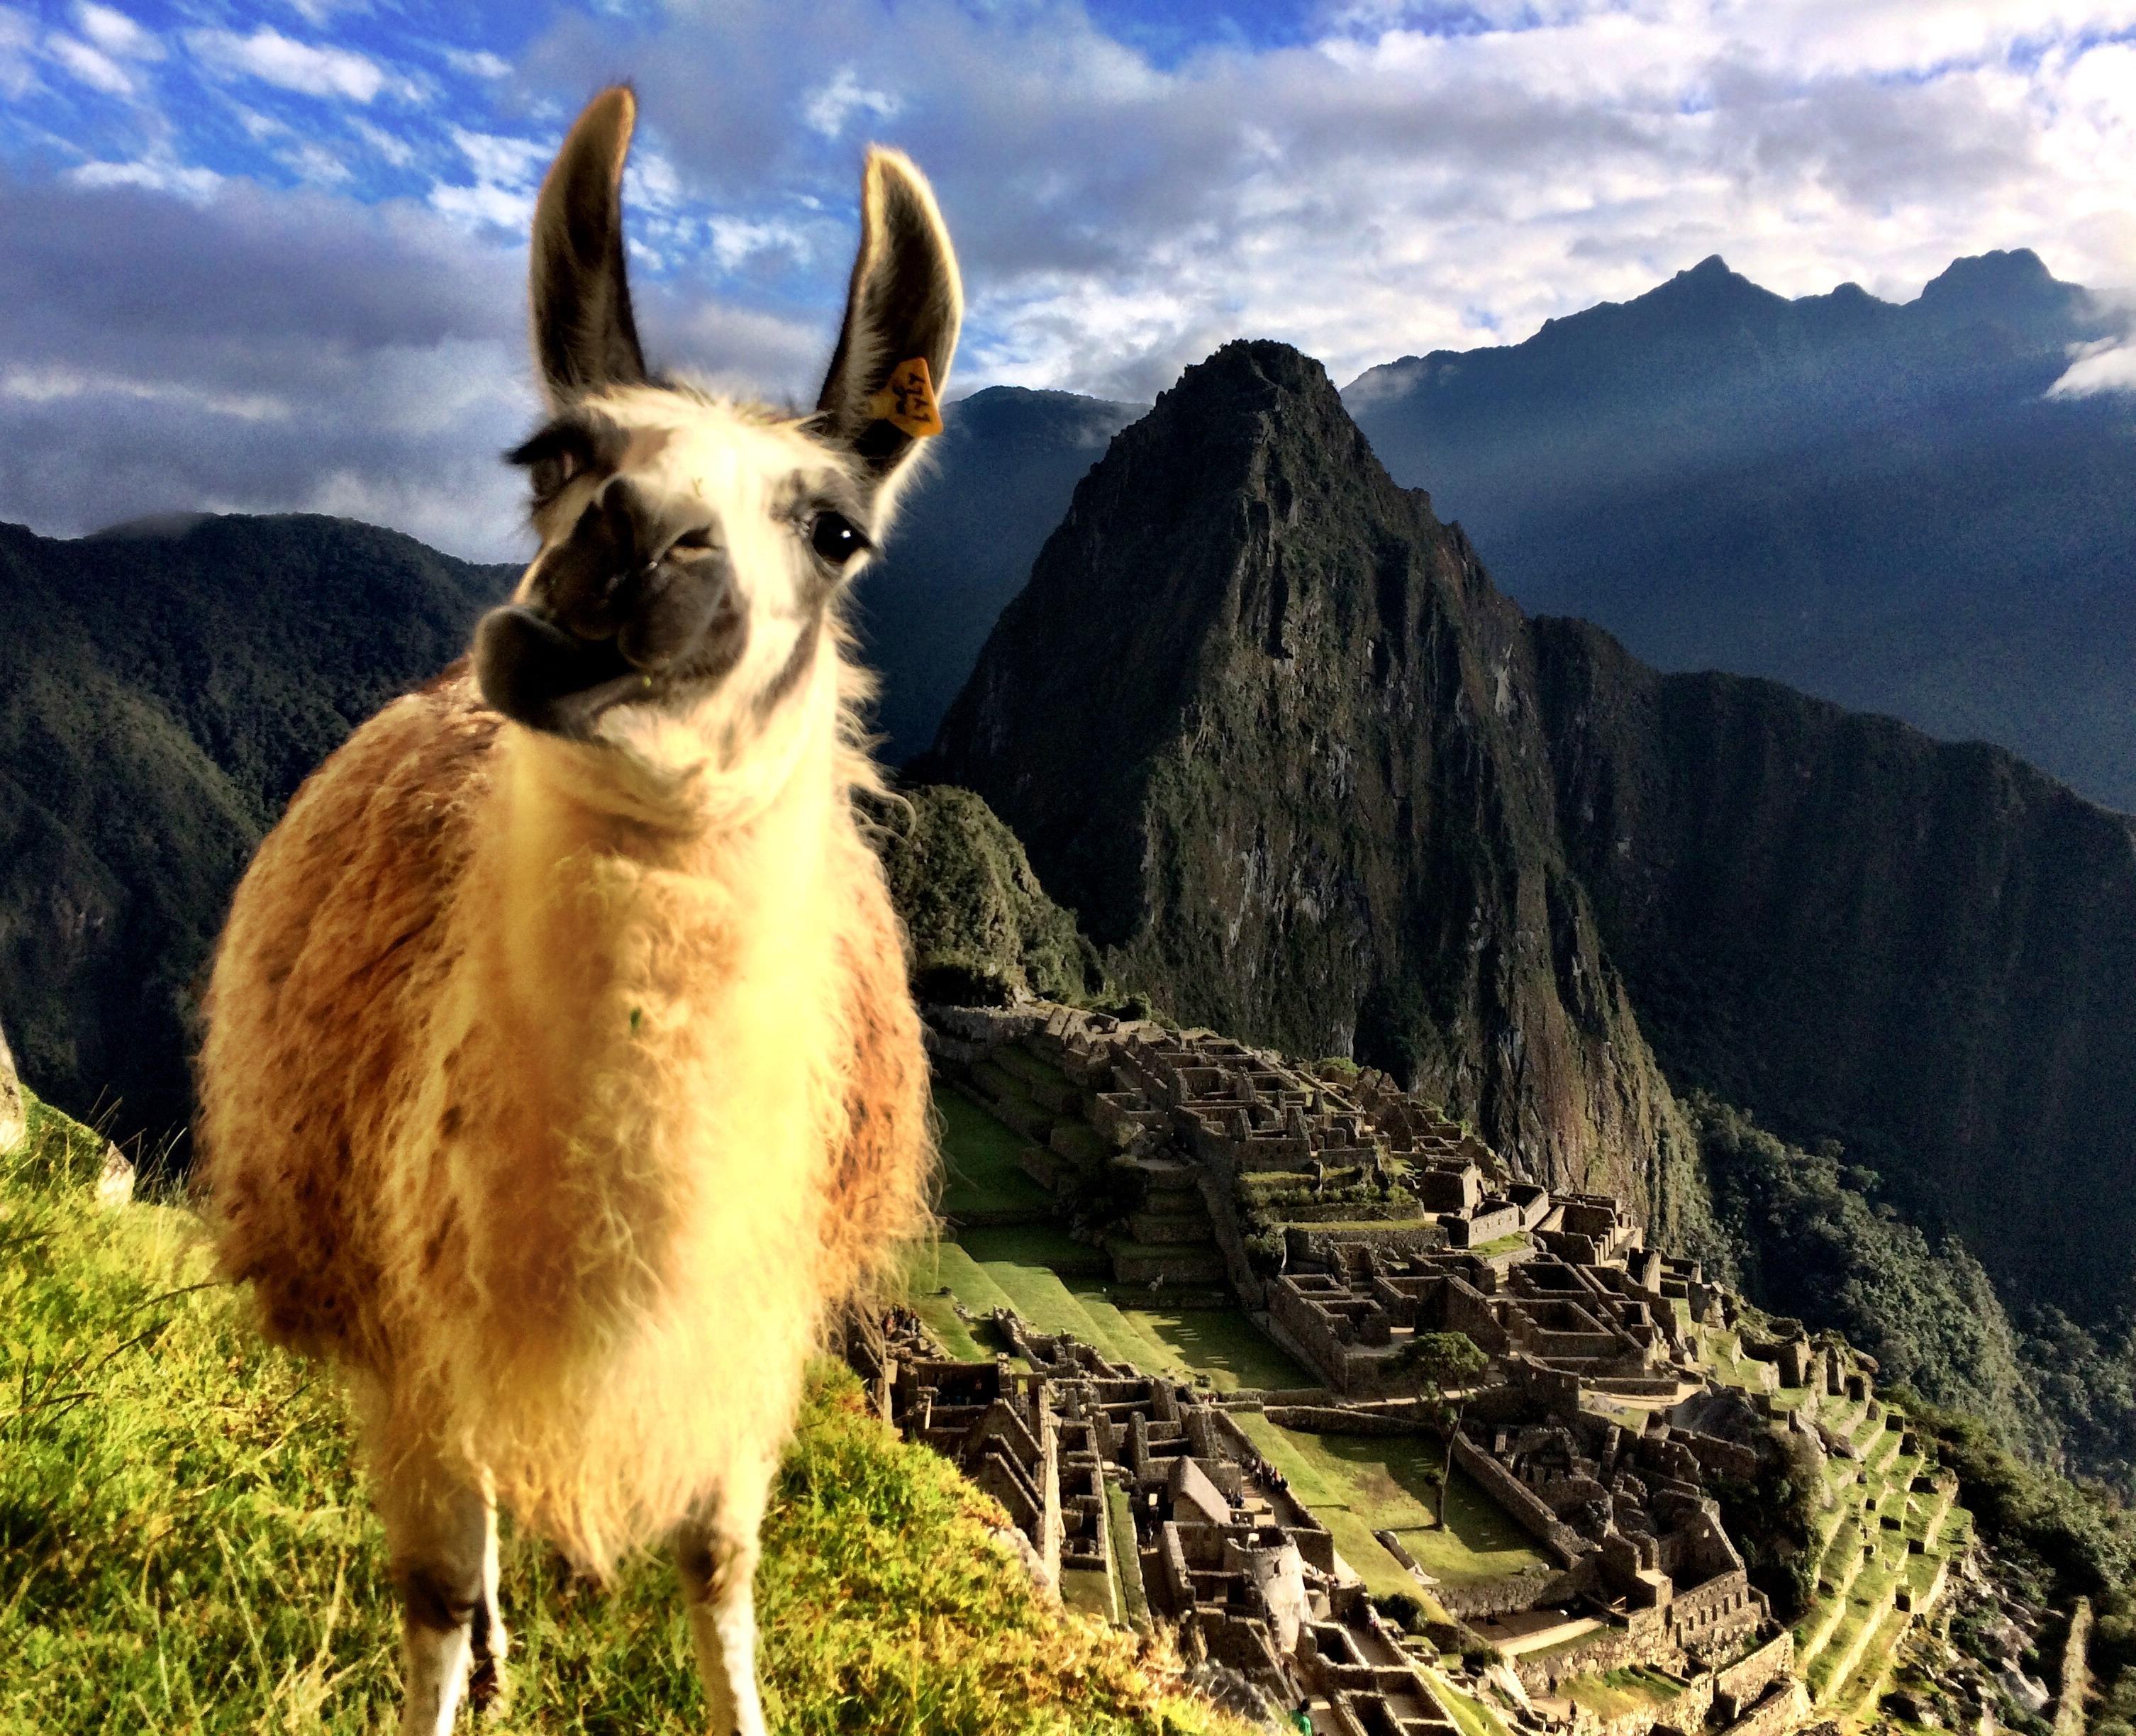 Curious Llama At Machu Picchu